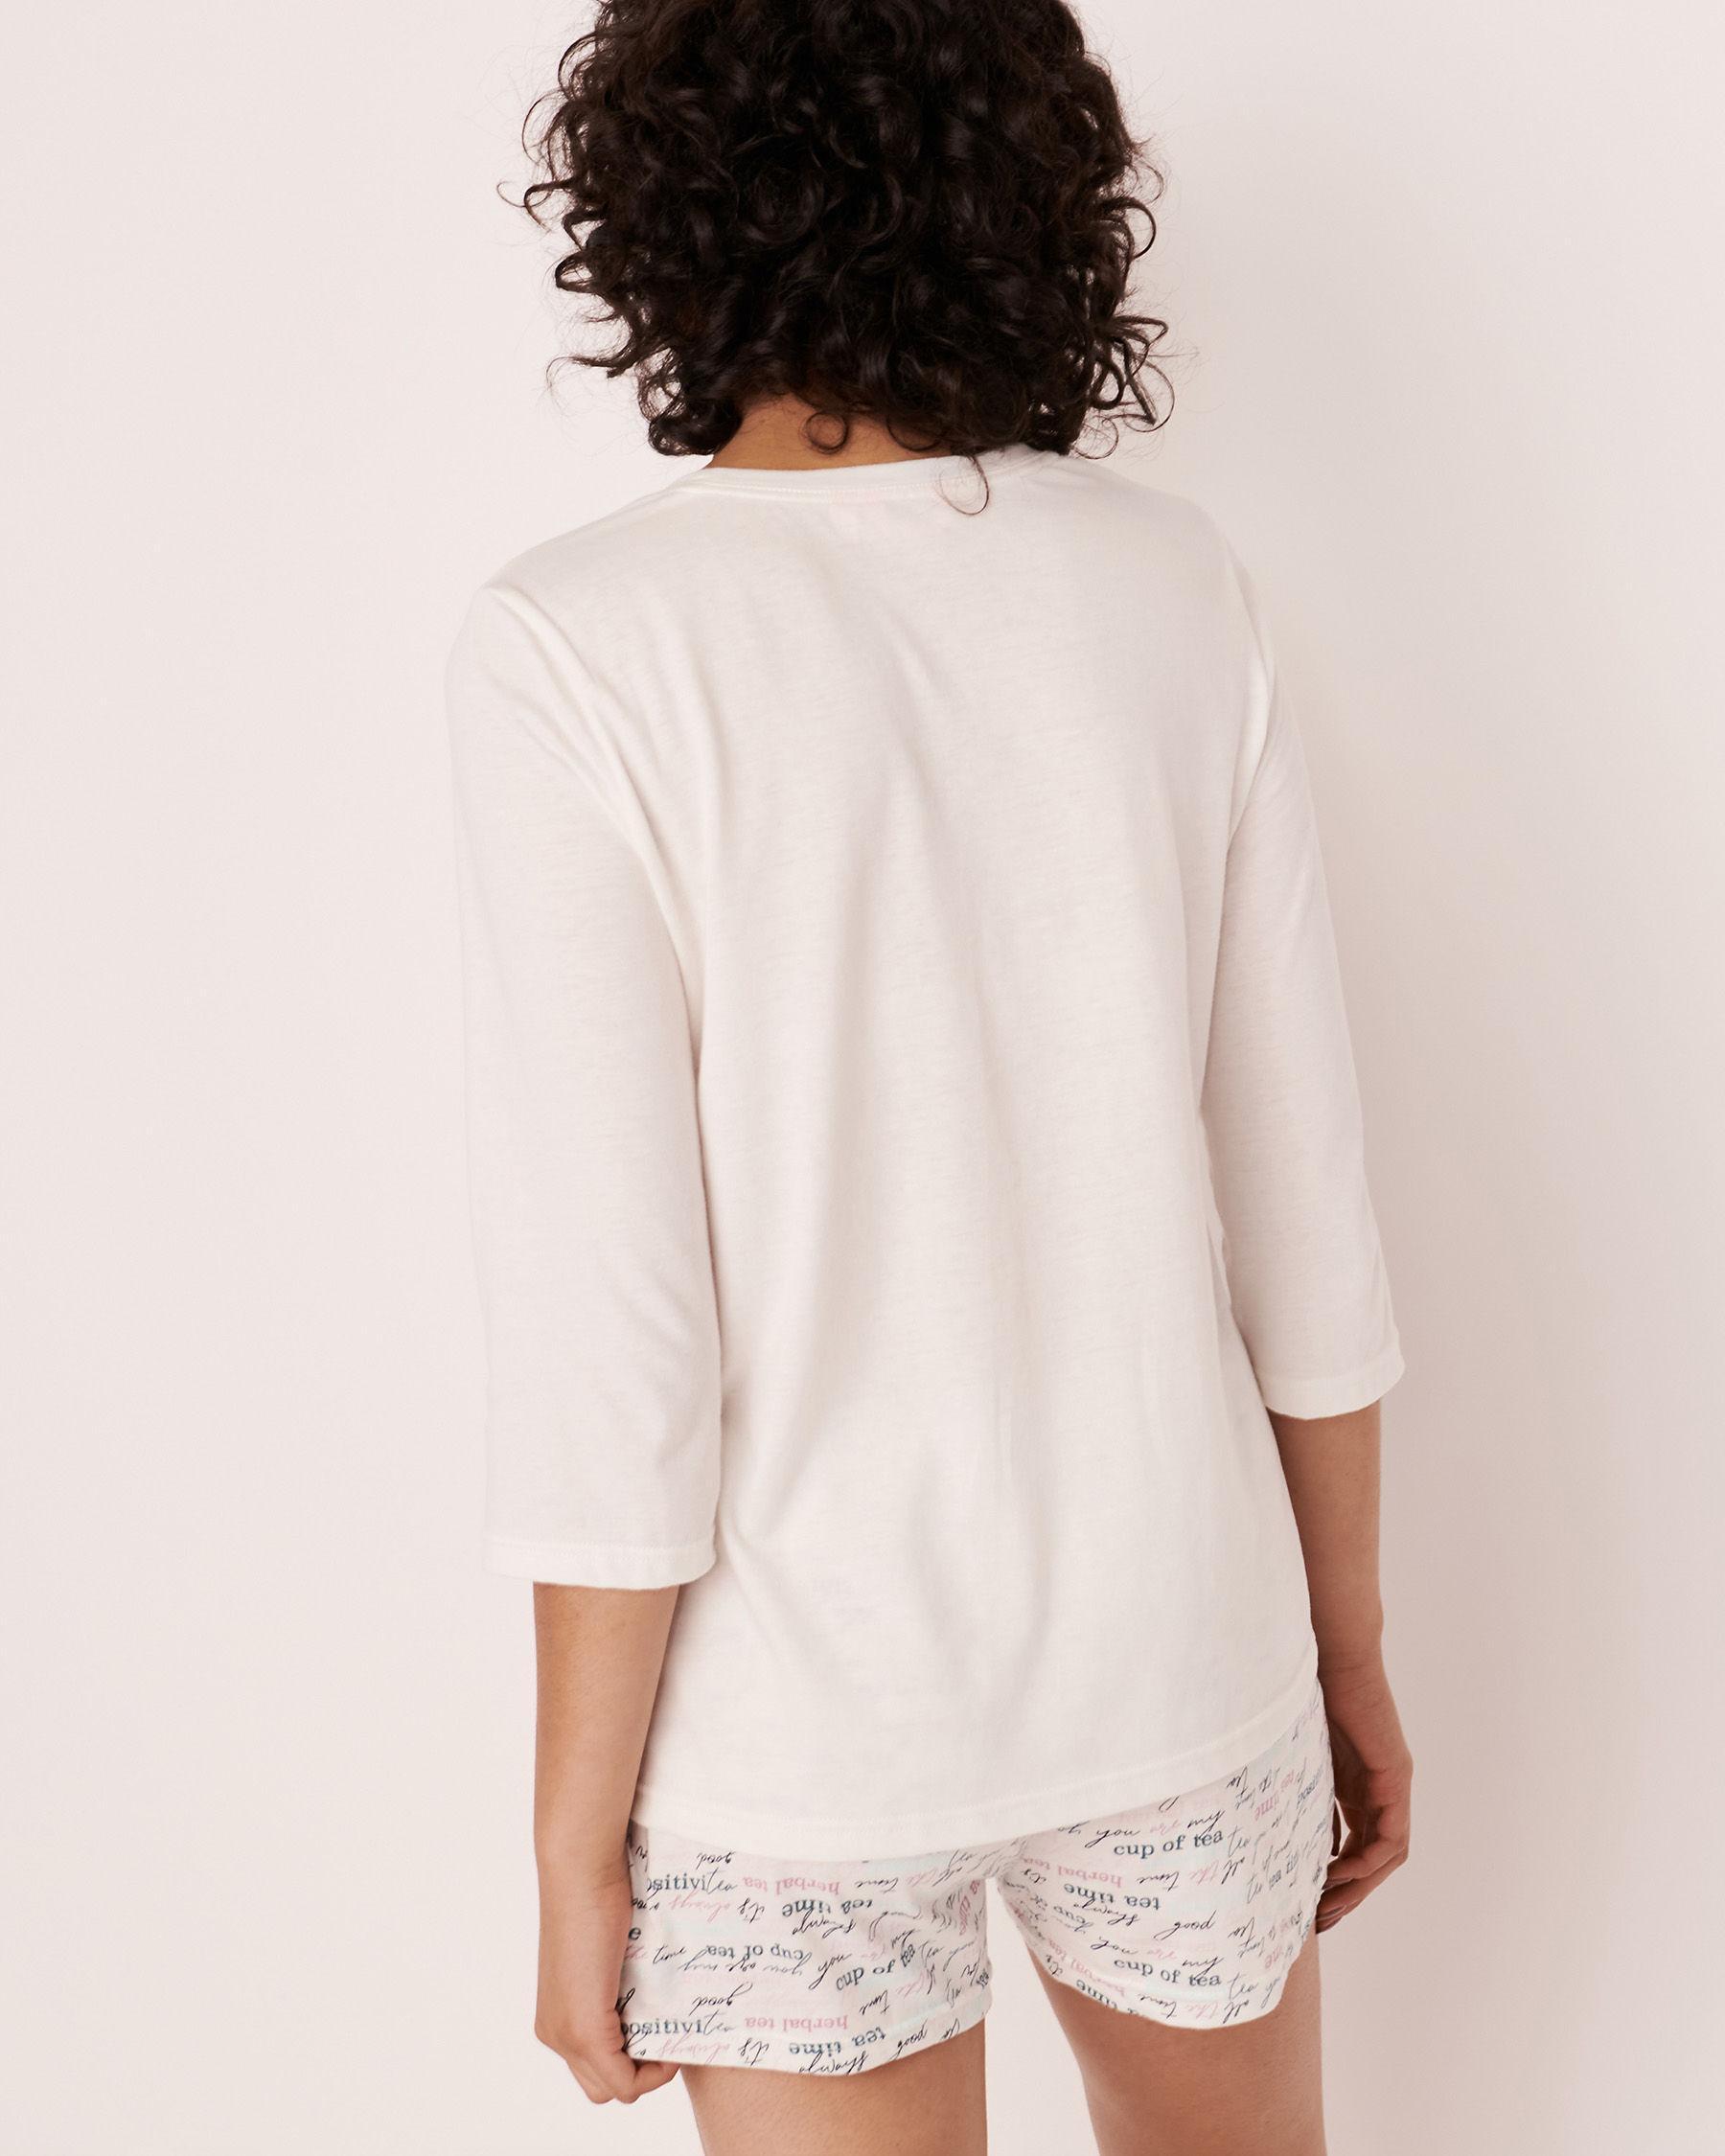 LA VIE EN ROSE V-neckline 3/4 Sleeve Shirt White 40100179 - View2